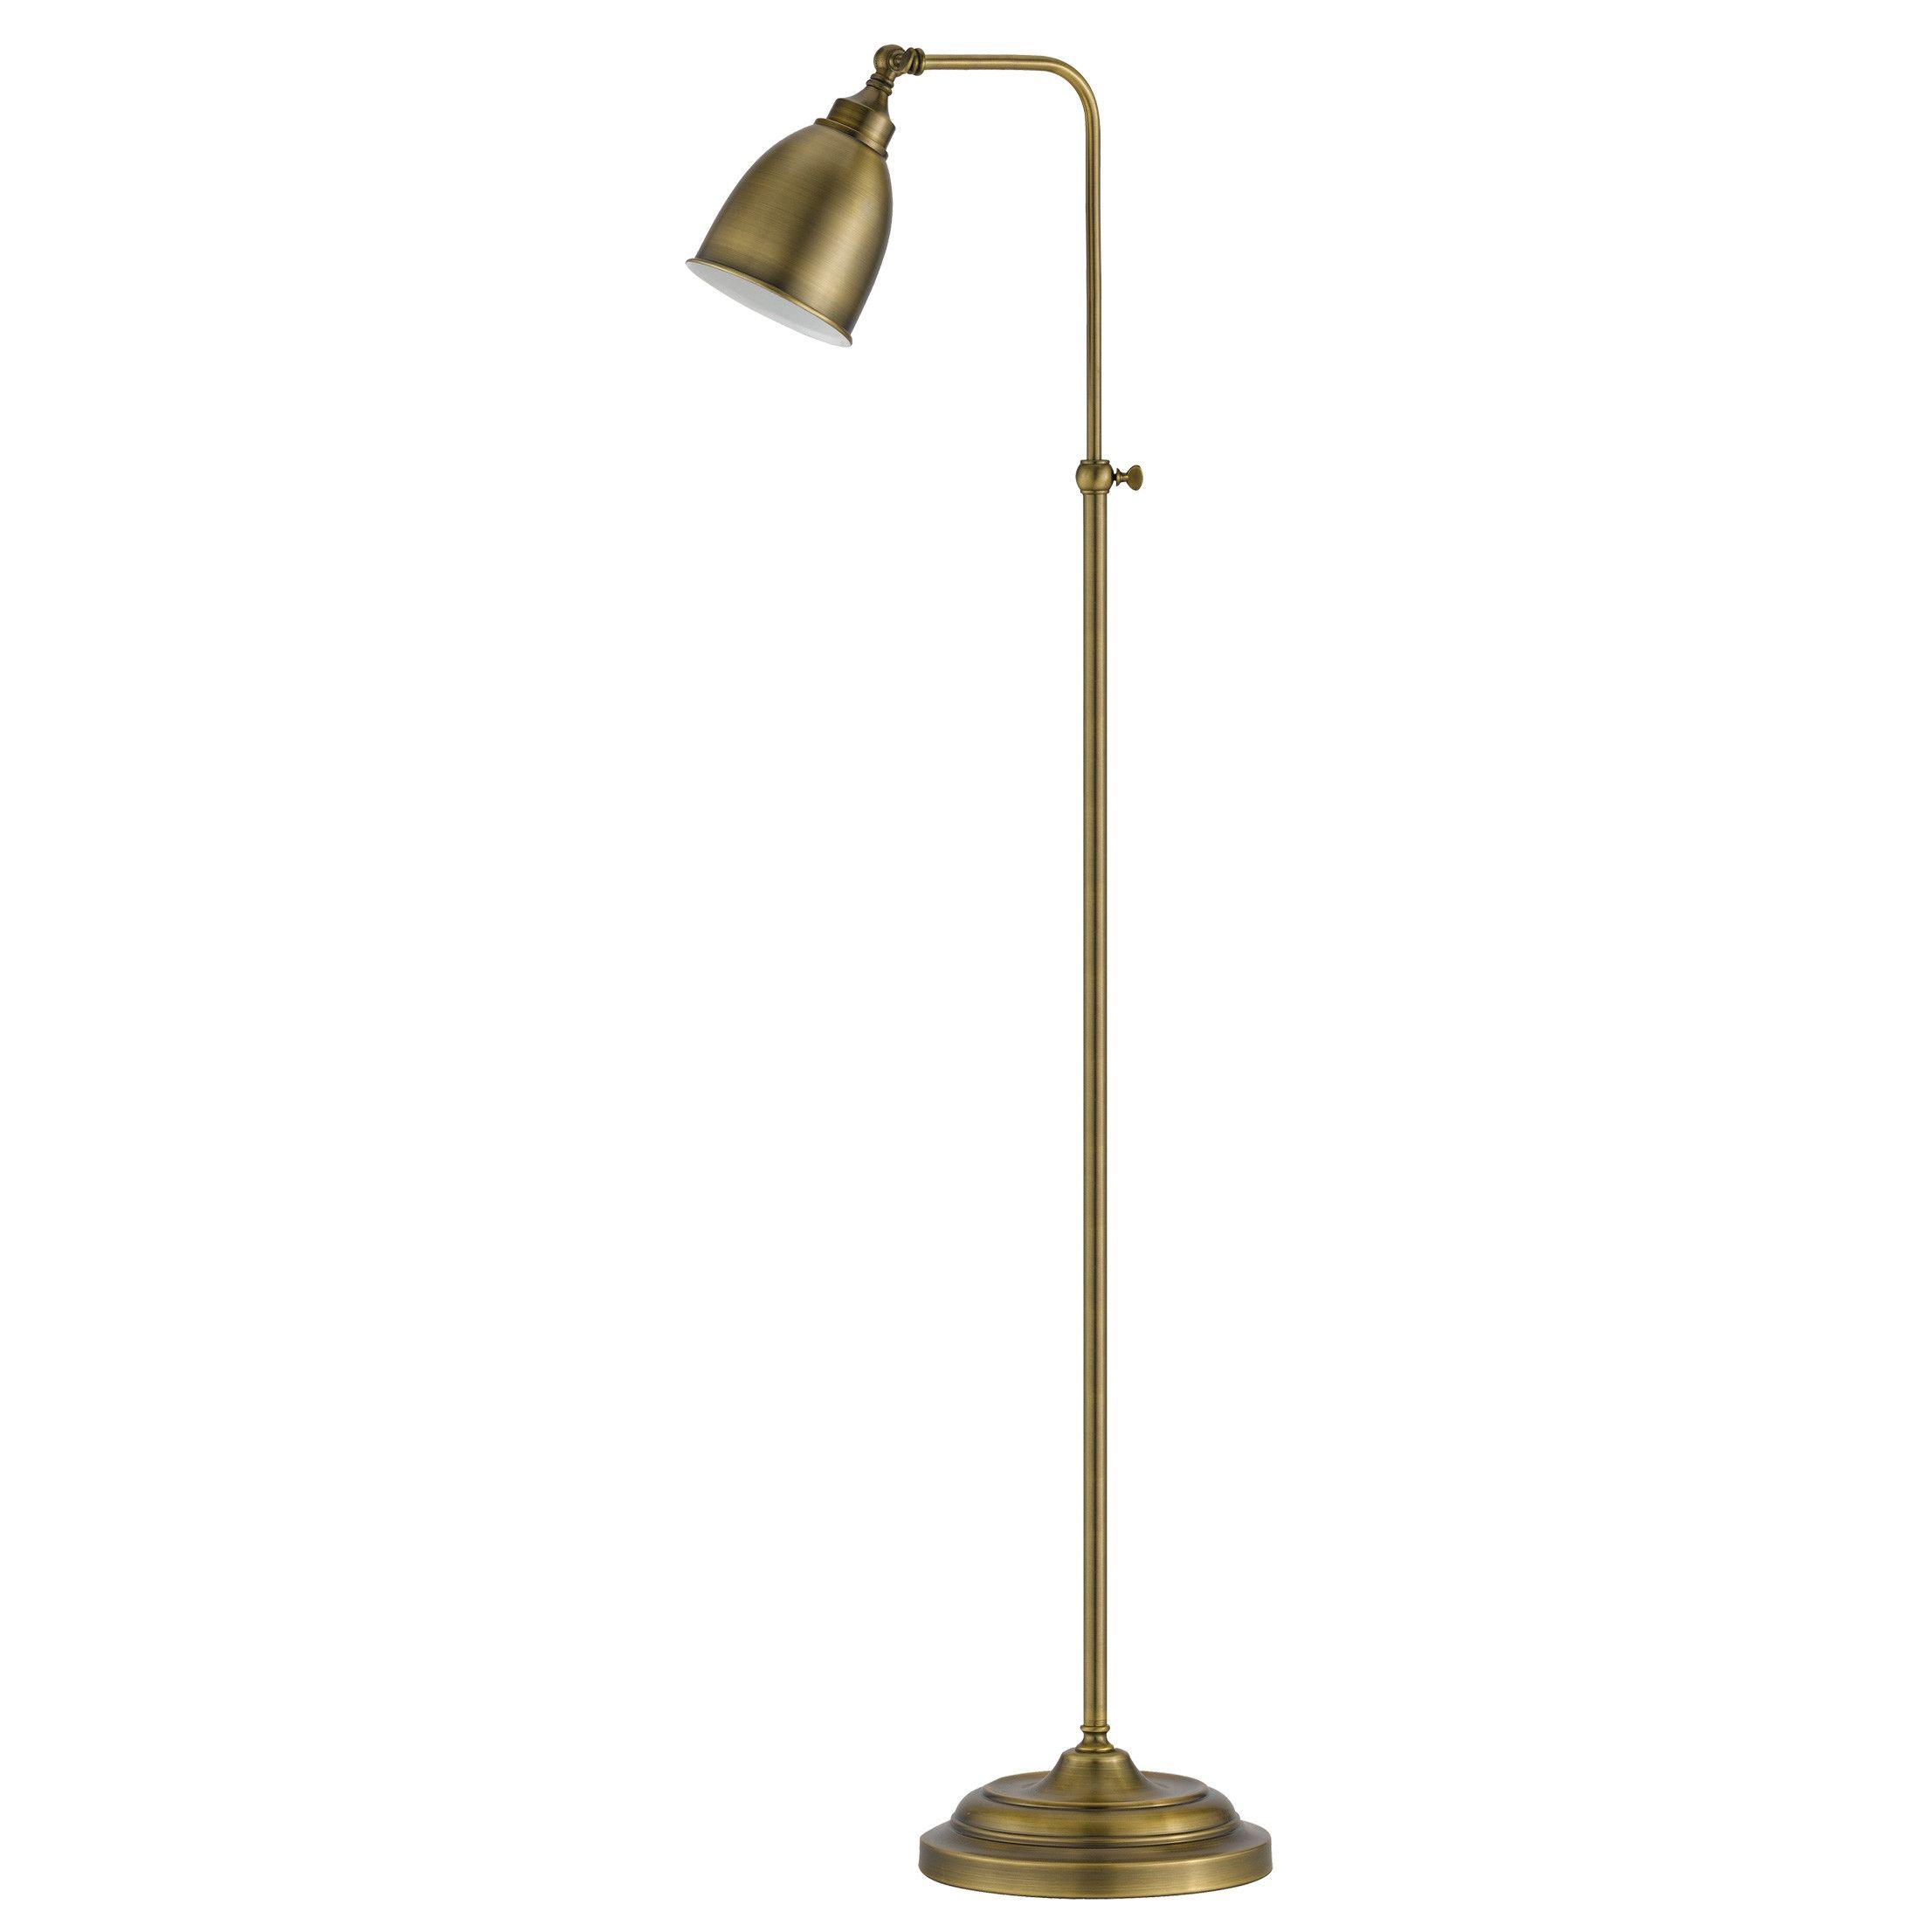 Cal Lighting Boylston Adjustable Floor Lamp